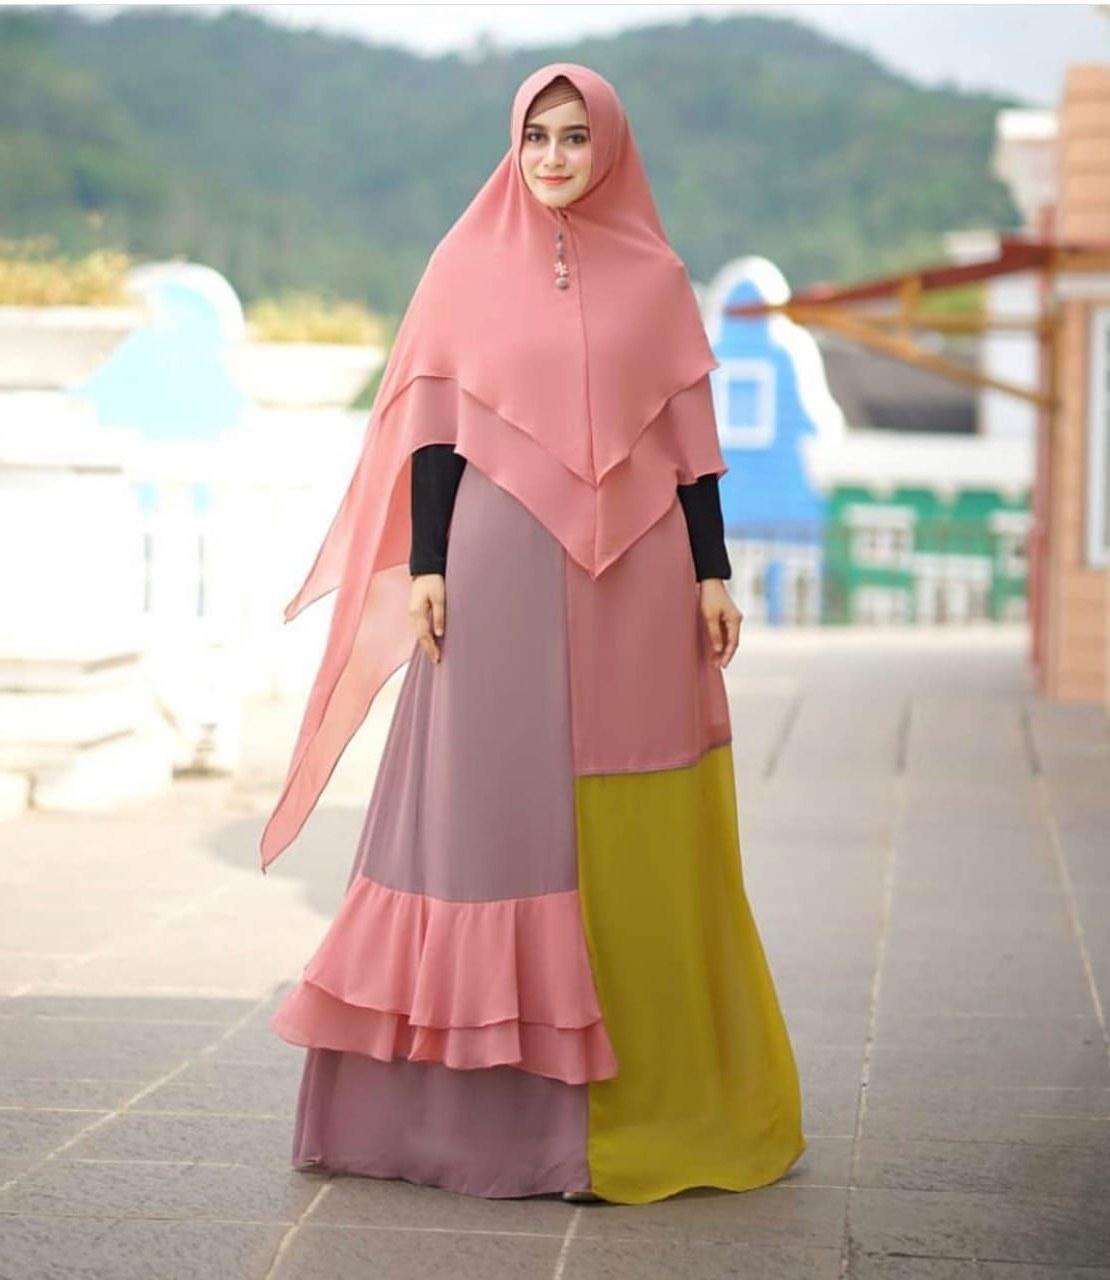 Model Baju Lebaran Syari 2019 Wddj Trend Gamis Syar I Polos 2019 Nania Katalog Bajugamismu